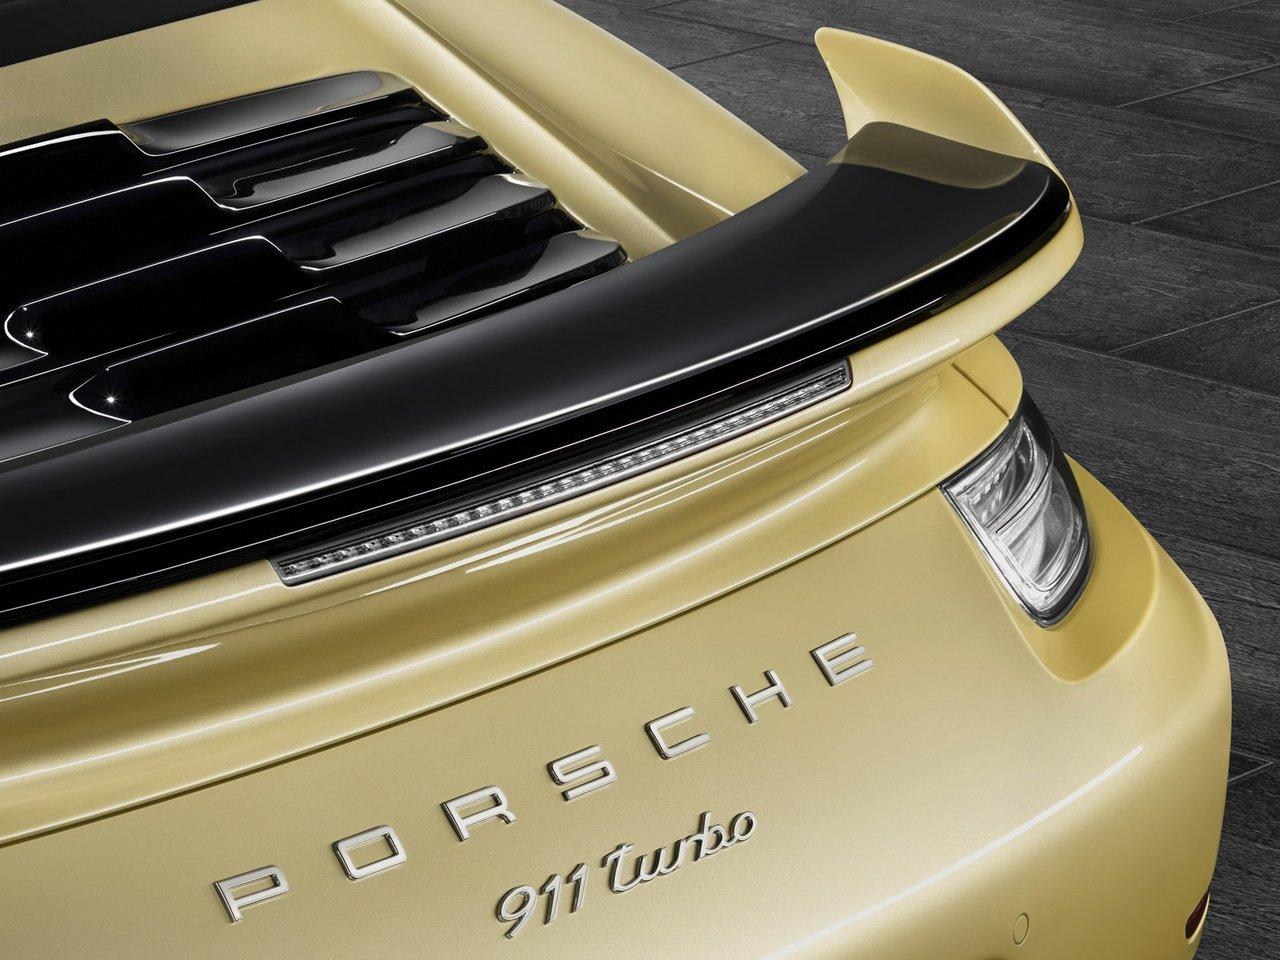 porsche-nuovo-aerokit-per-911-991-turbo-turbo-s_0-100_8